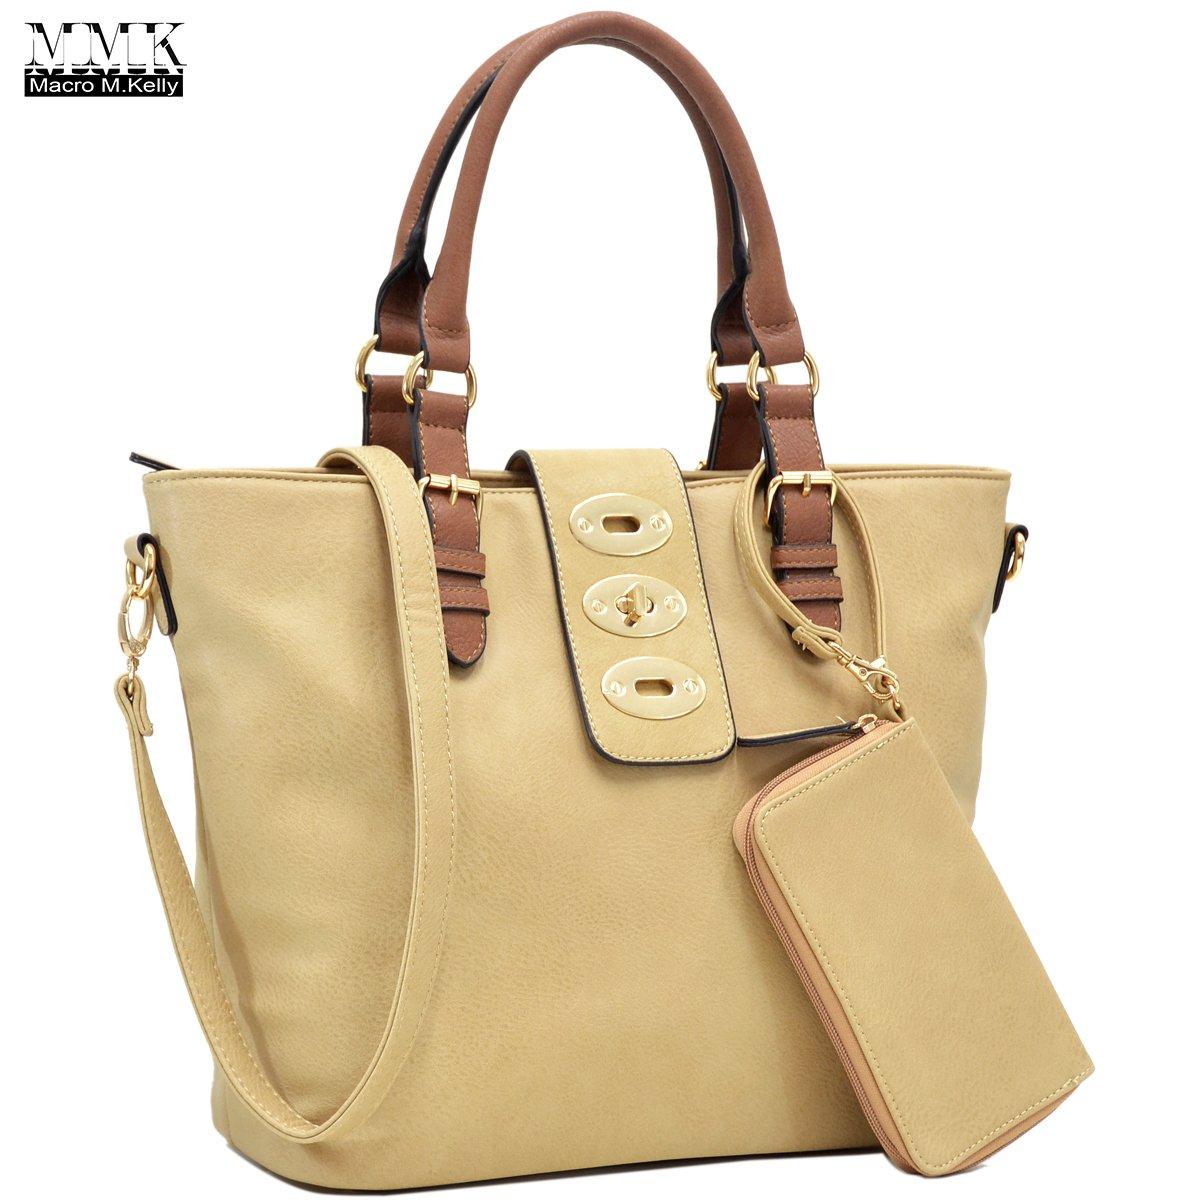 MMK collection Fashion handbag~Classic Tote bag~Holiday gift purse with Wallet~Beautiful Handbag wallet set~Crossbody handbag (MA-07-6717-BG/CF)